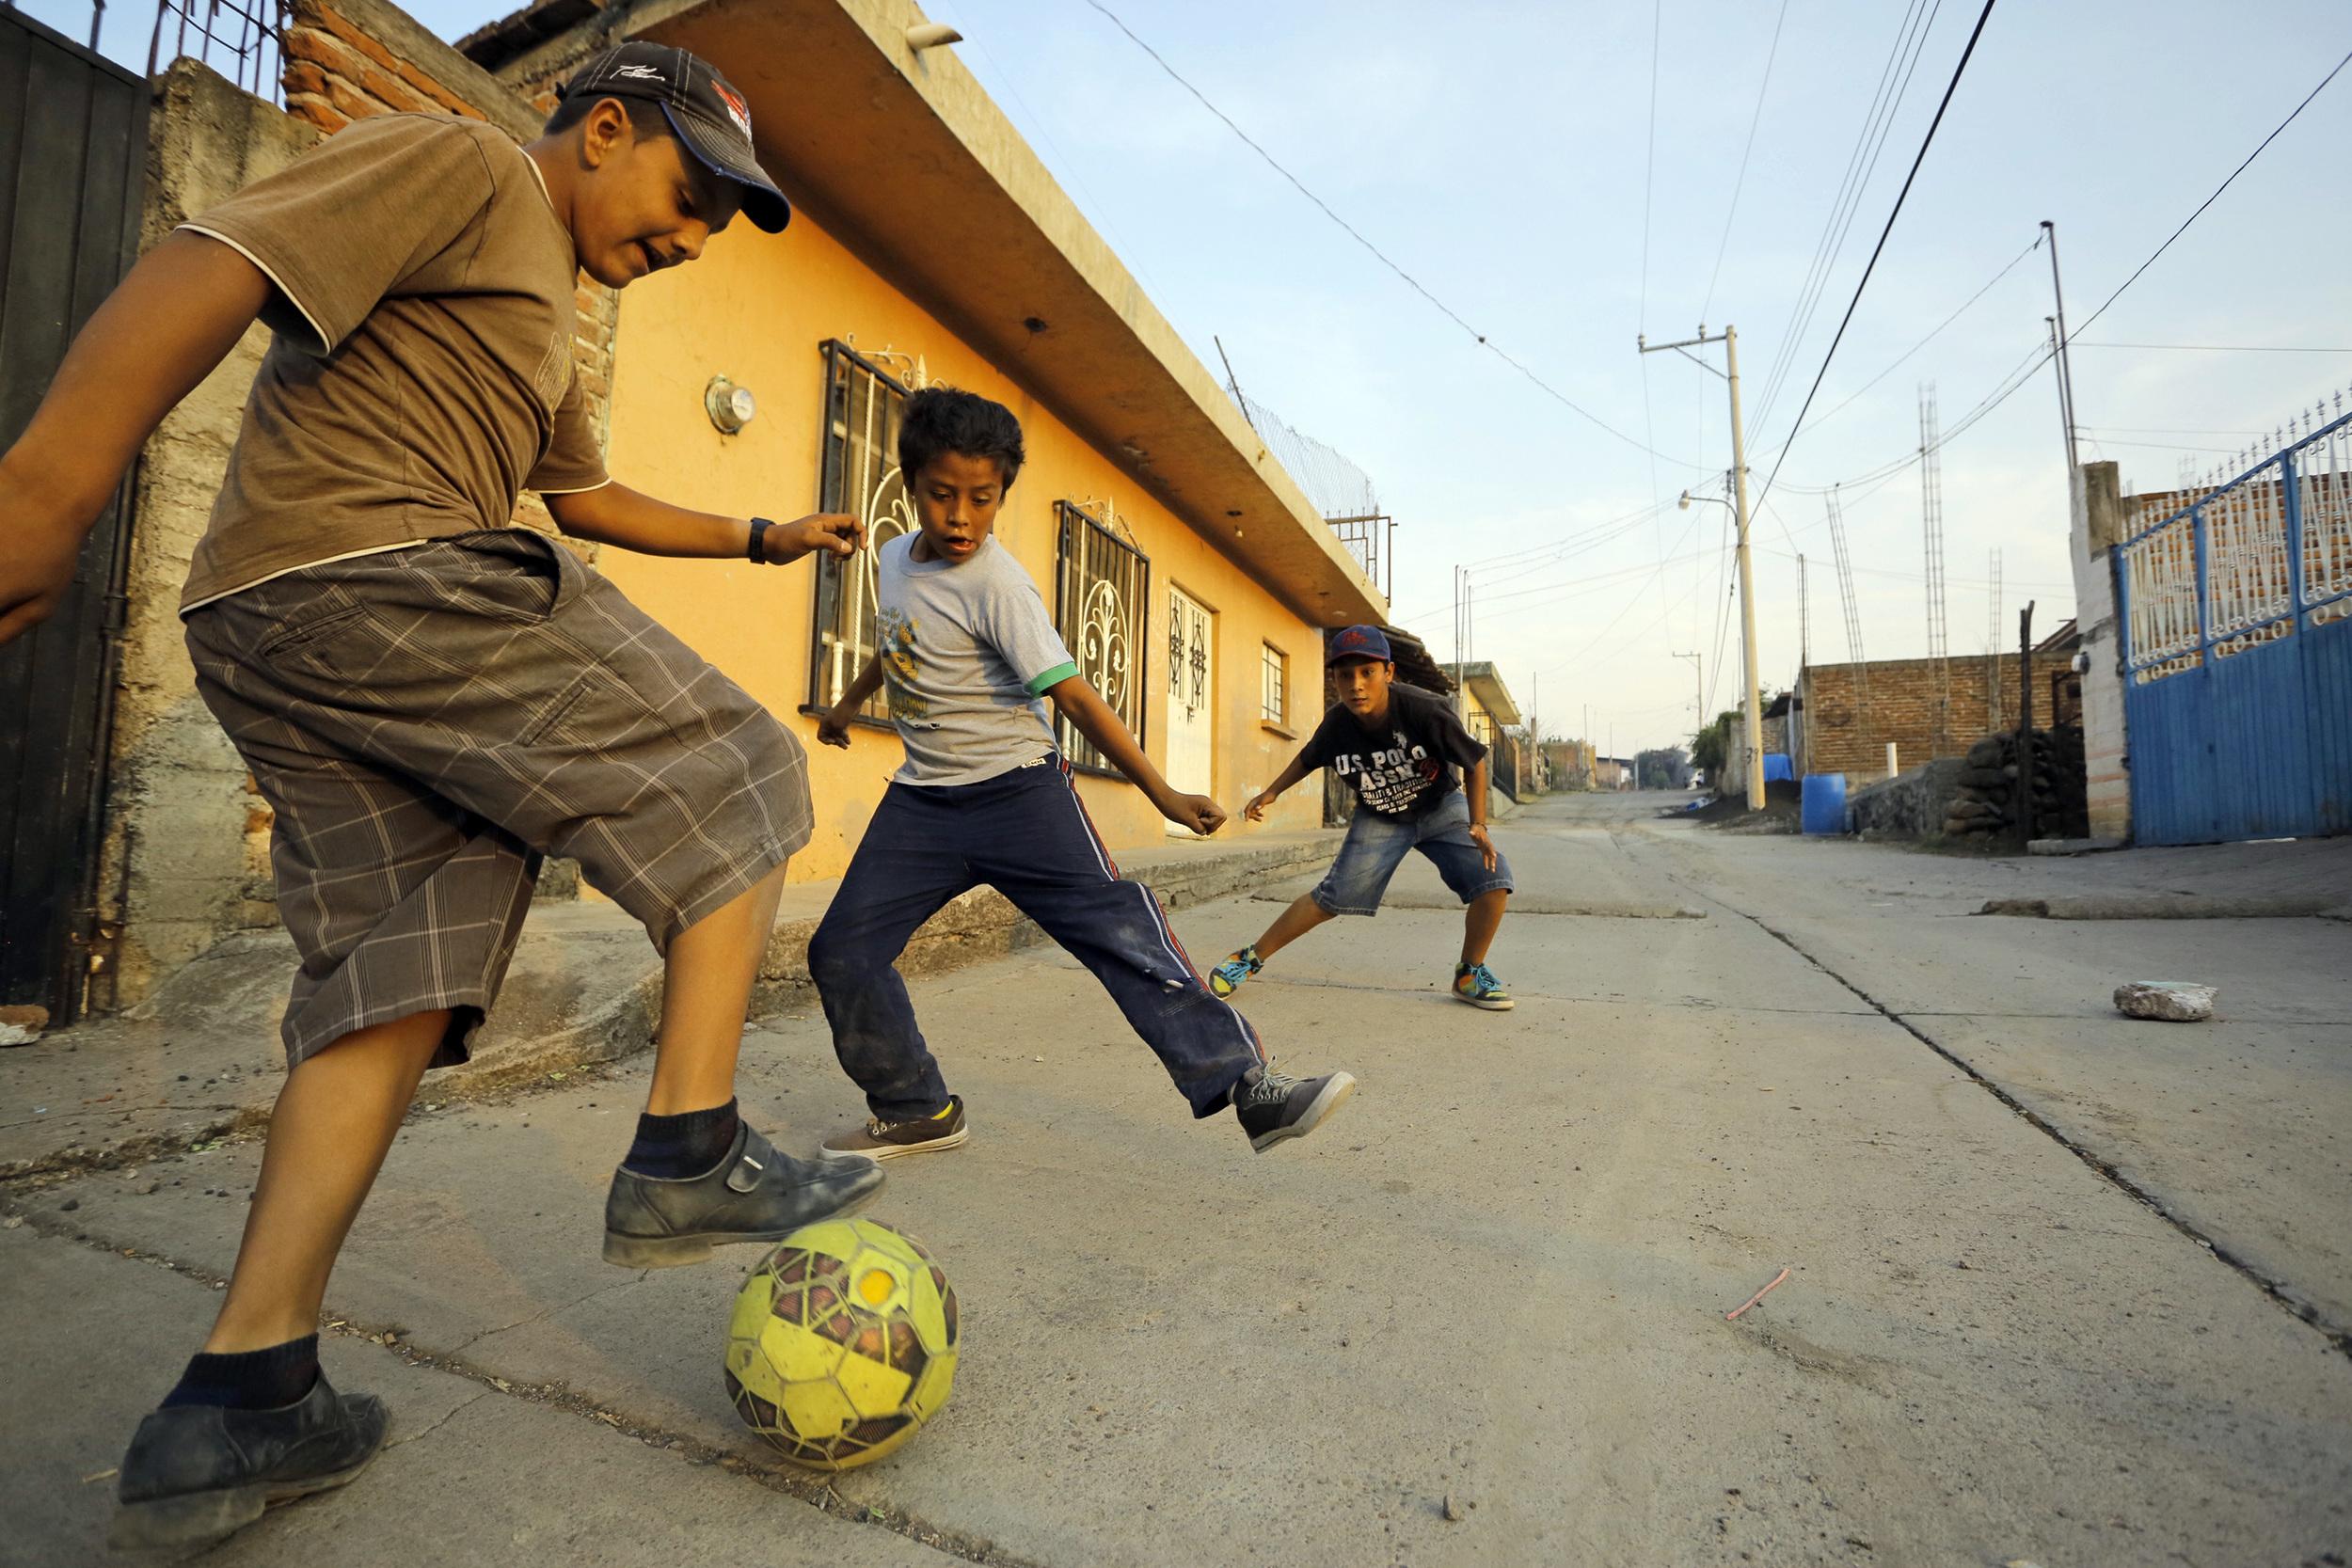 futbol en la calle_3000.jpg